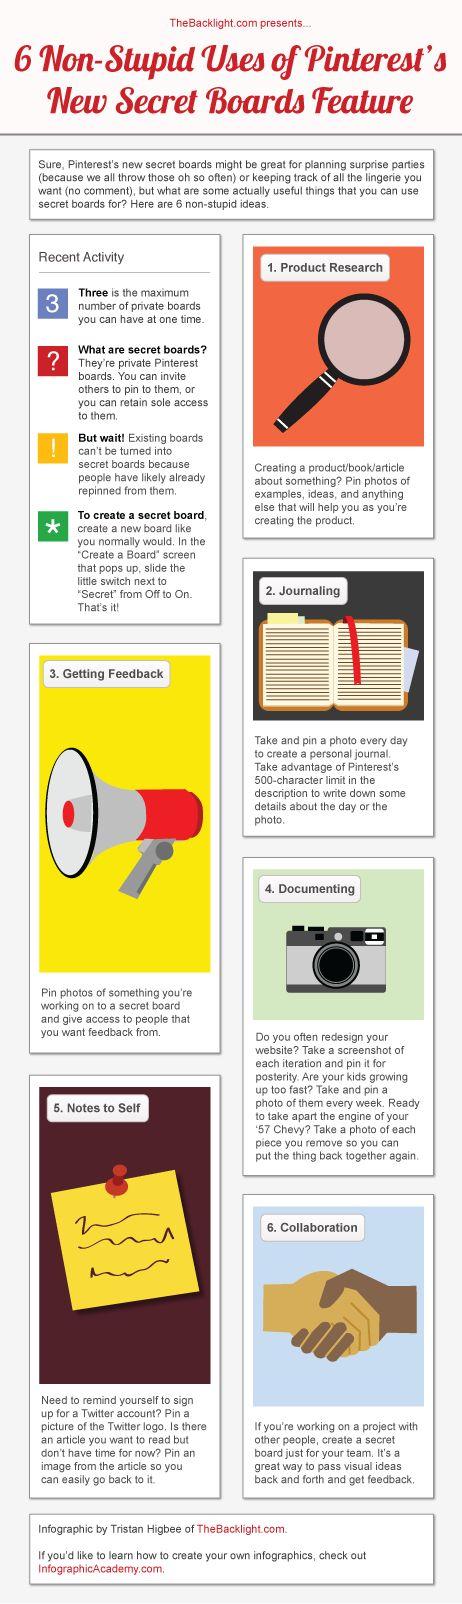 6 Uses of Pinterest's Secret Boards